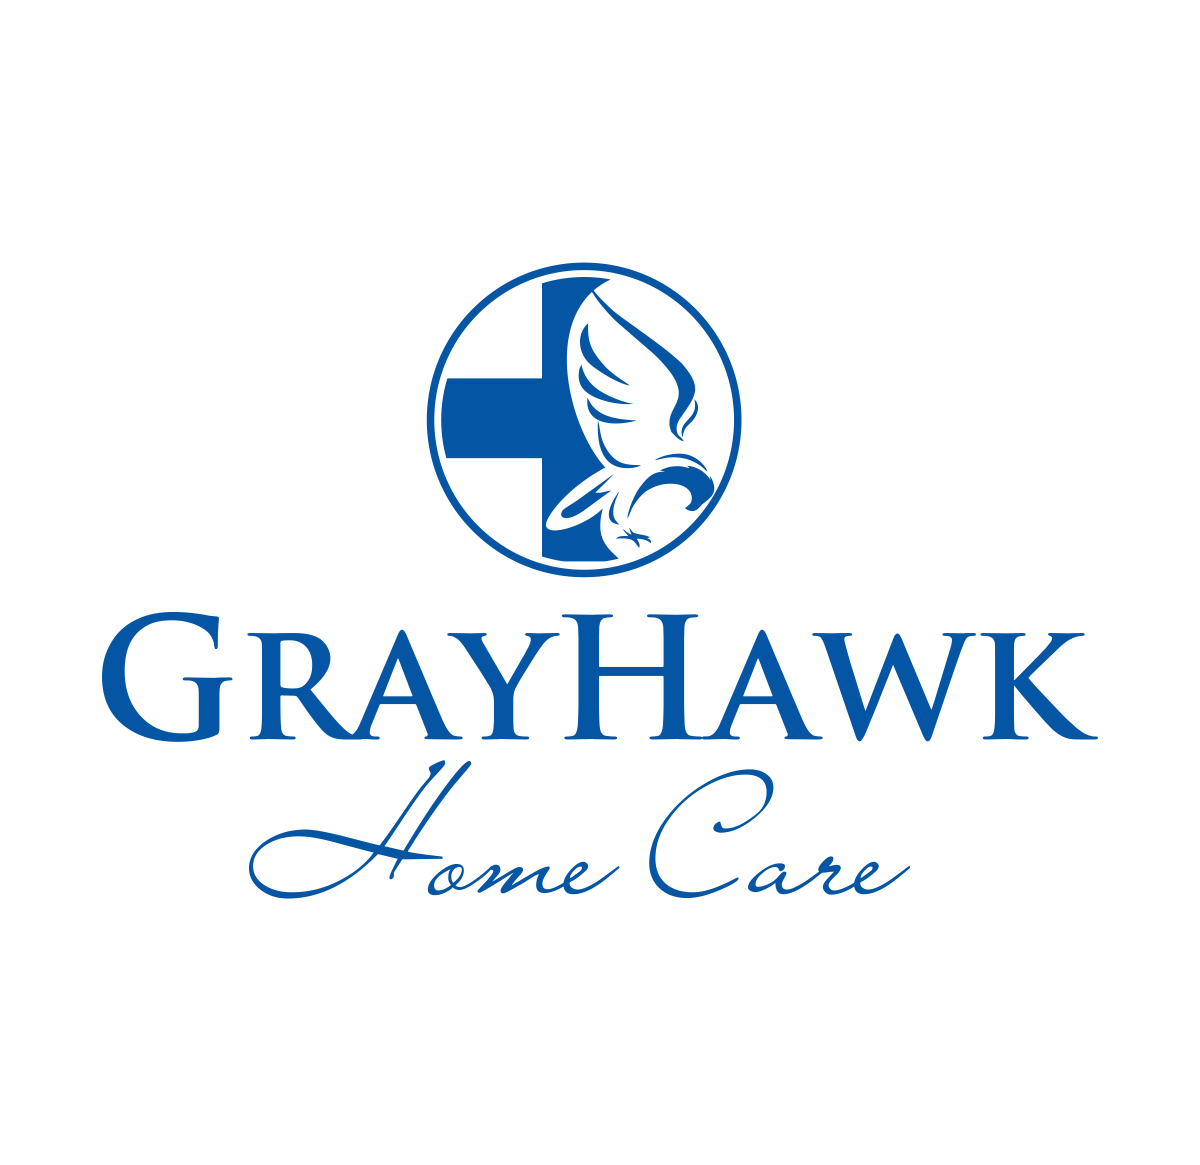 feminine serious home health care logo design for grayhawk home care by logo designer design. Black Bedroom Furniture Sets. Home Design Ideas